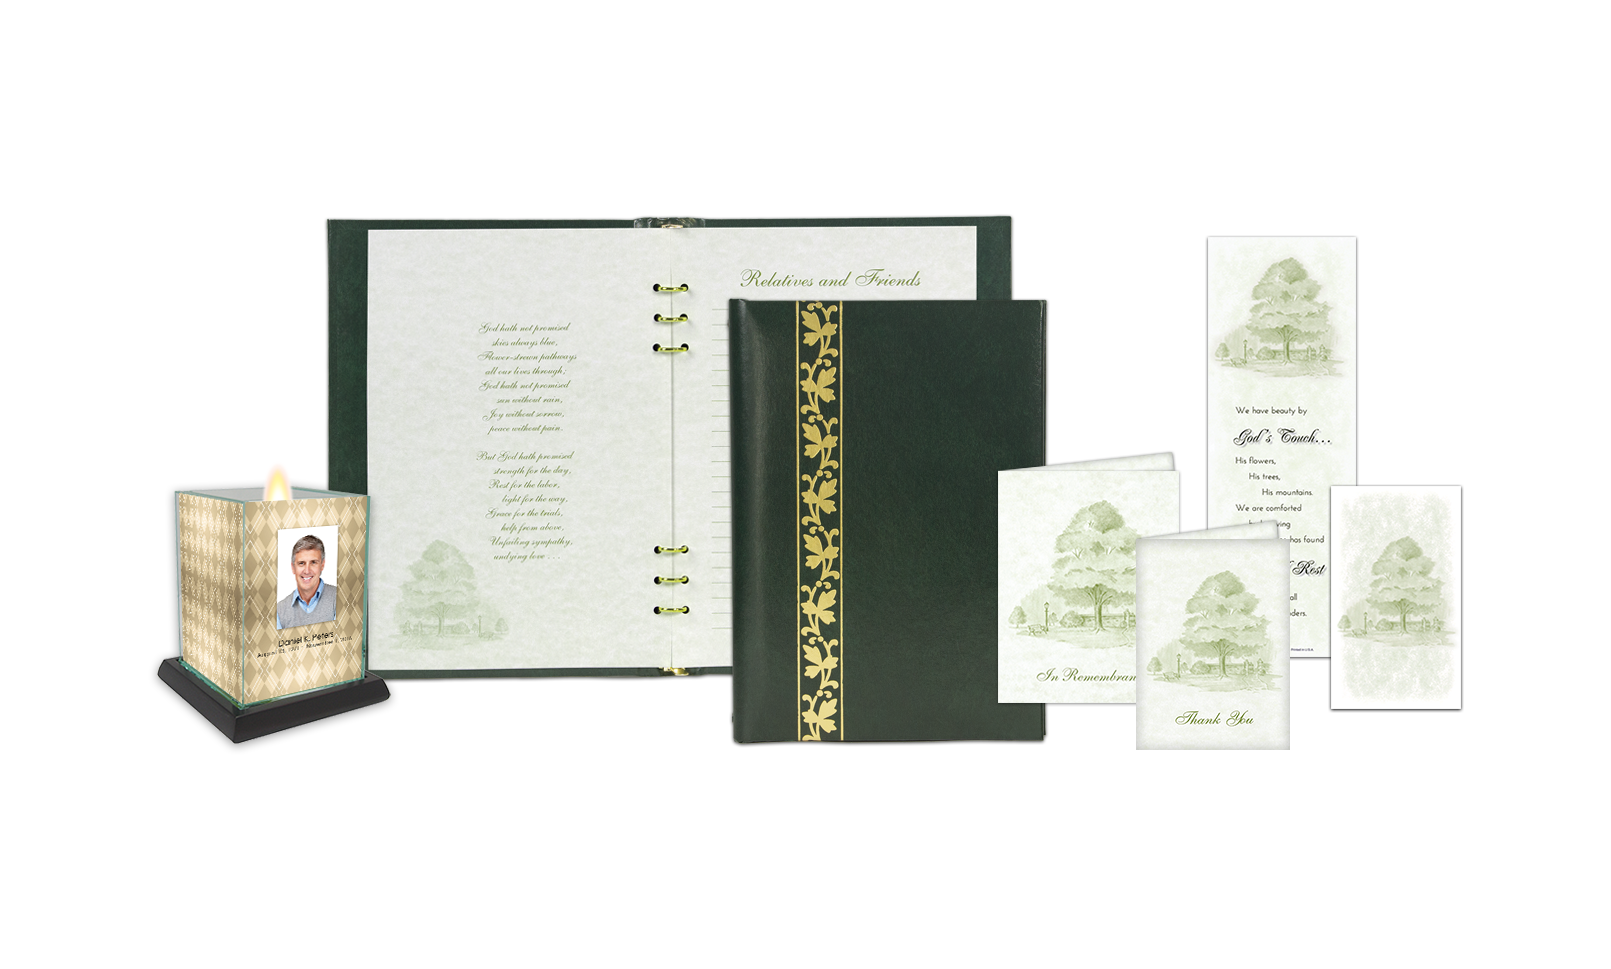 ROL Gold Leaf Filigree Green Series 202 PSG